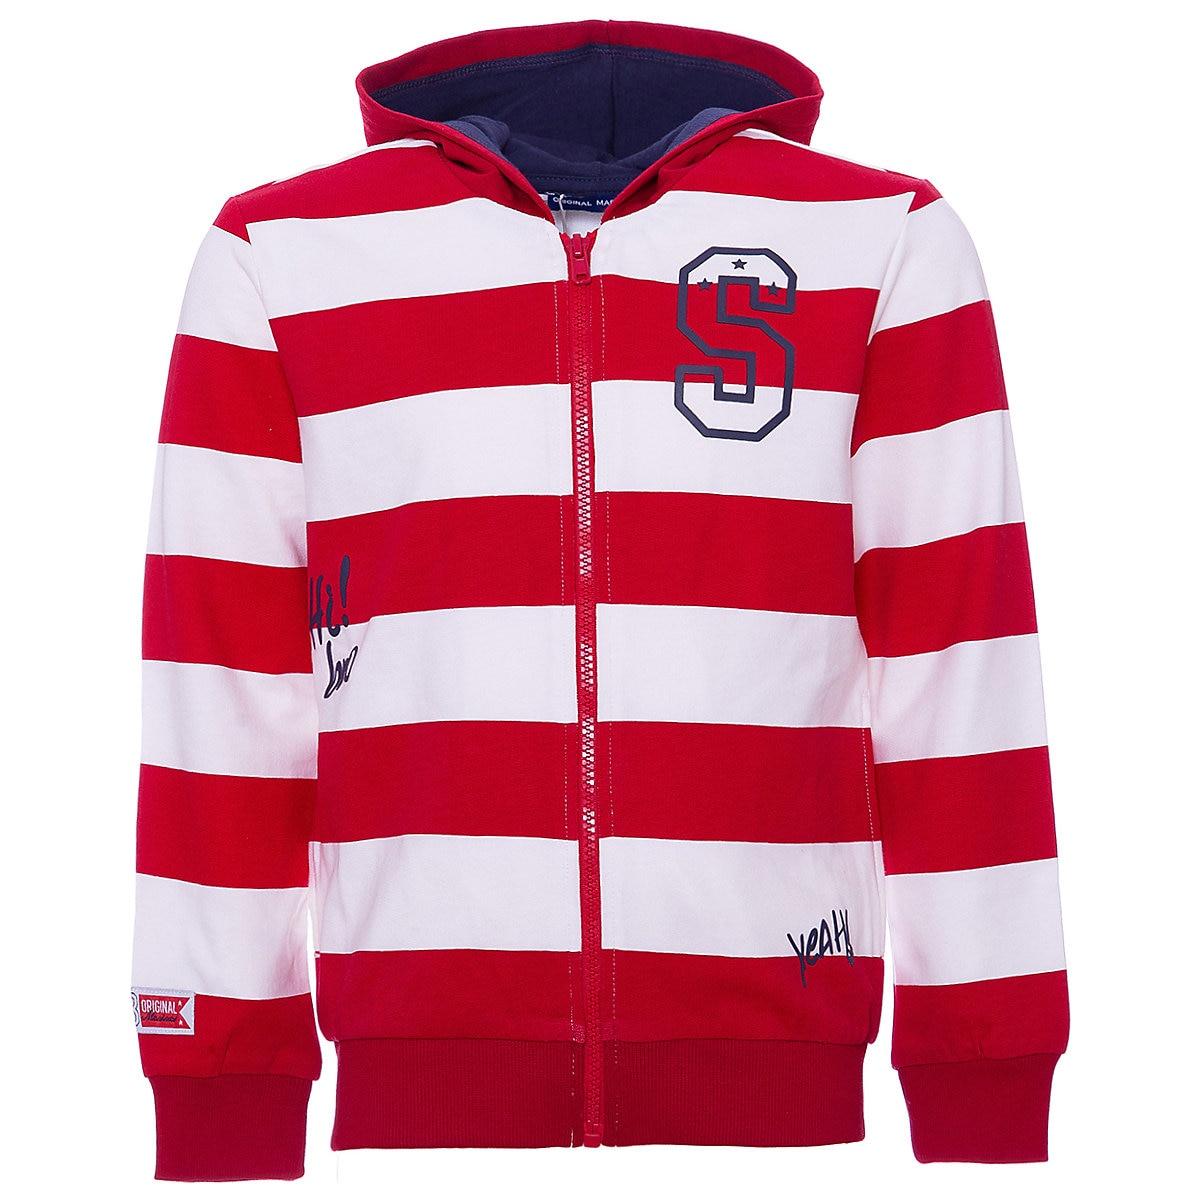 Original Marines Hoodies & Sweatshirts 9501055 Cotton Boys Casual children clothing boy hoodies